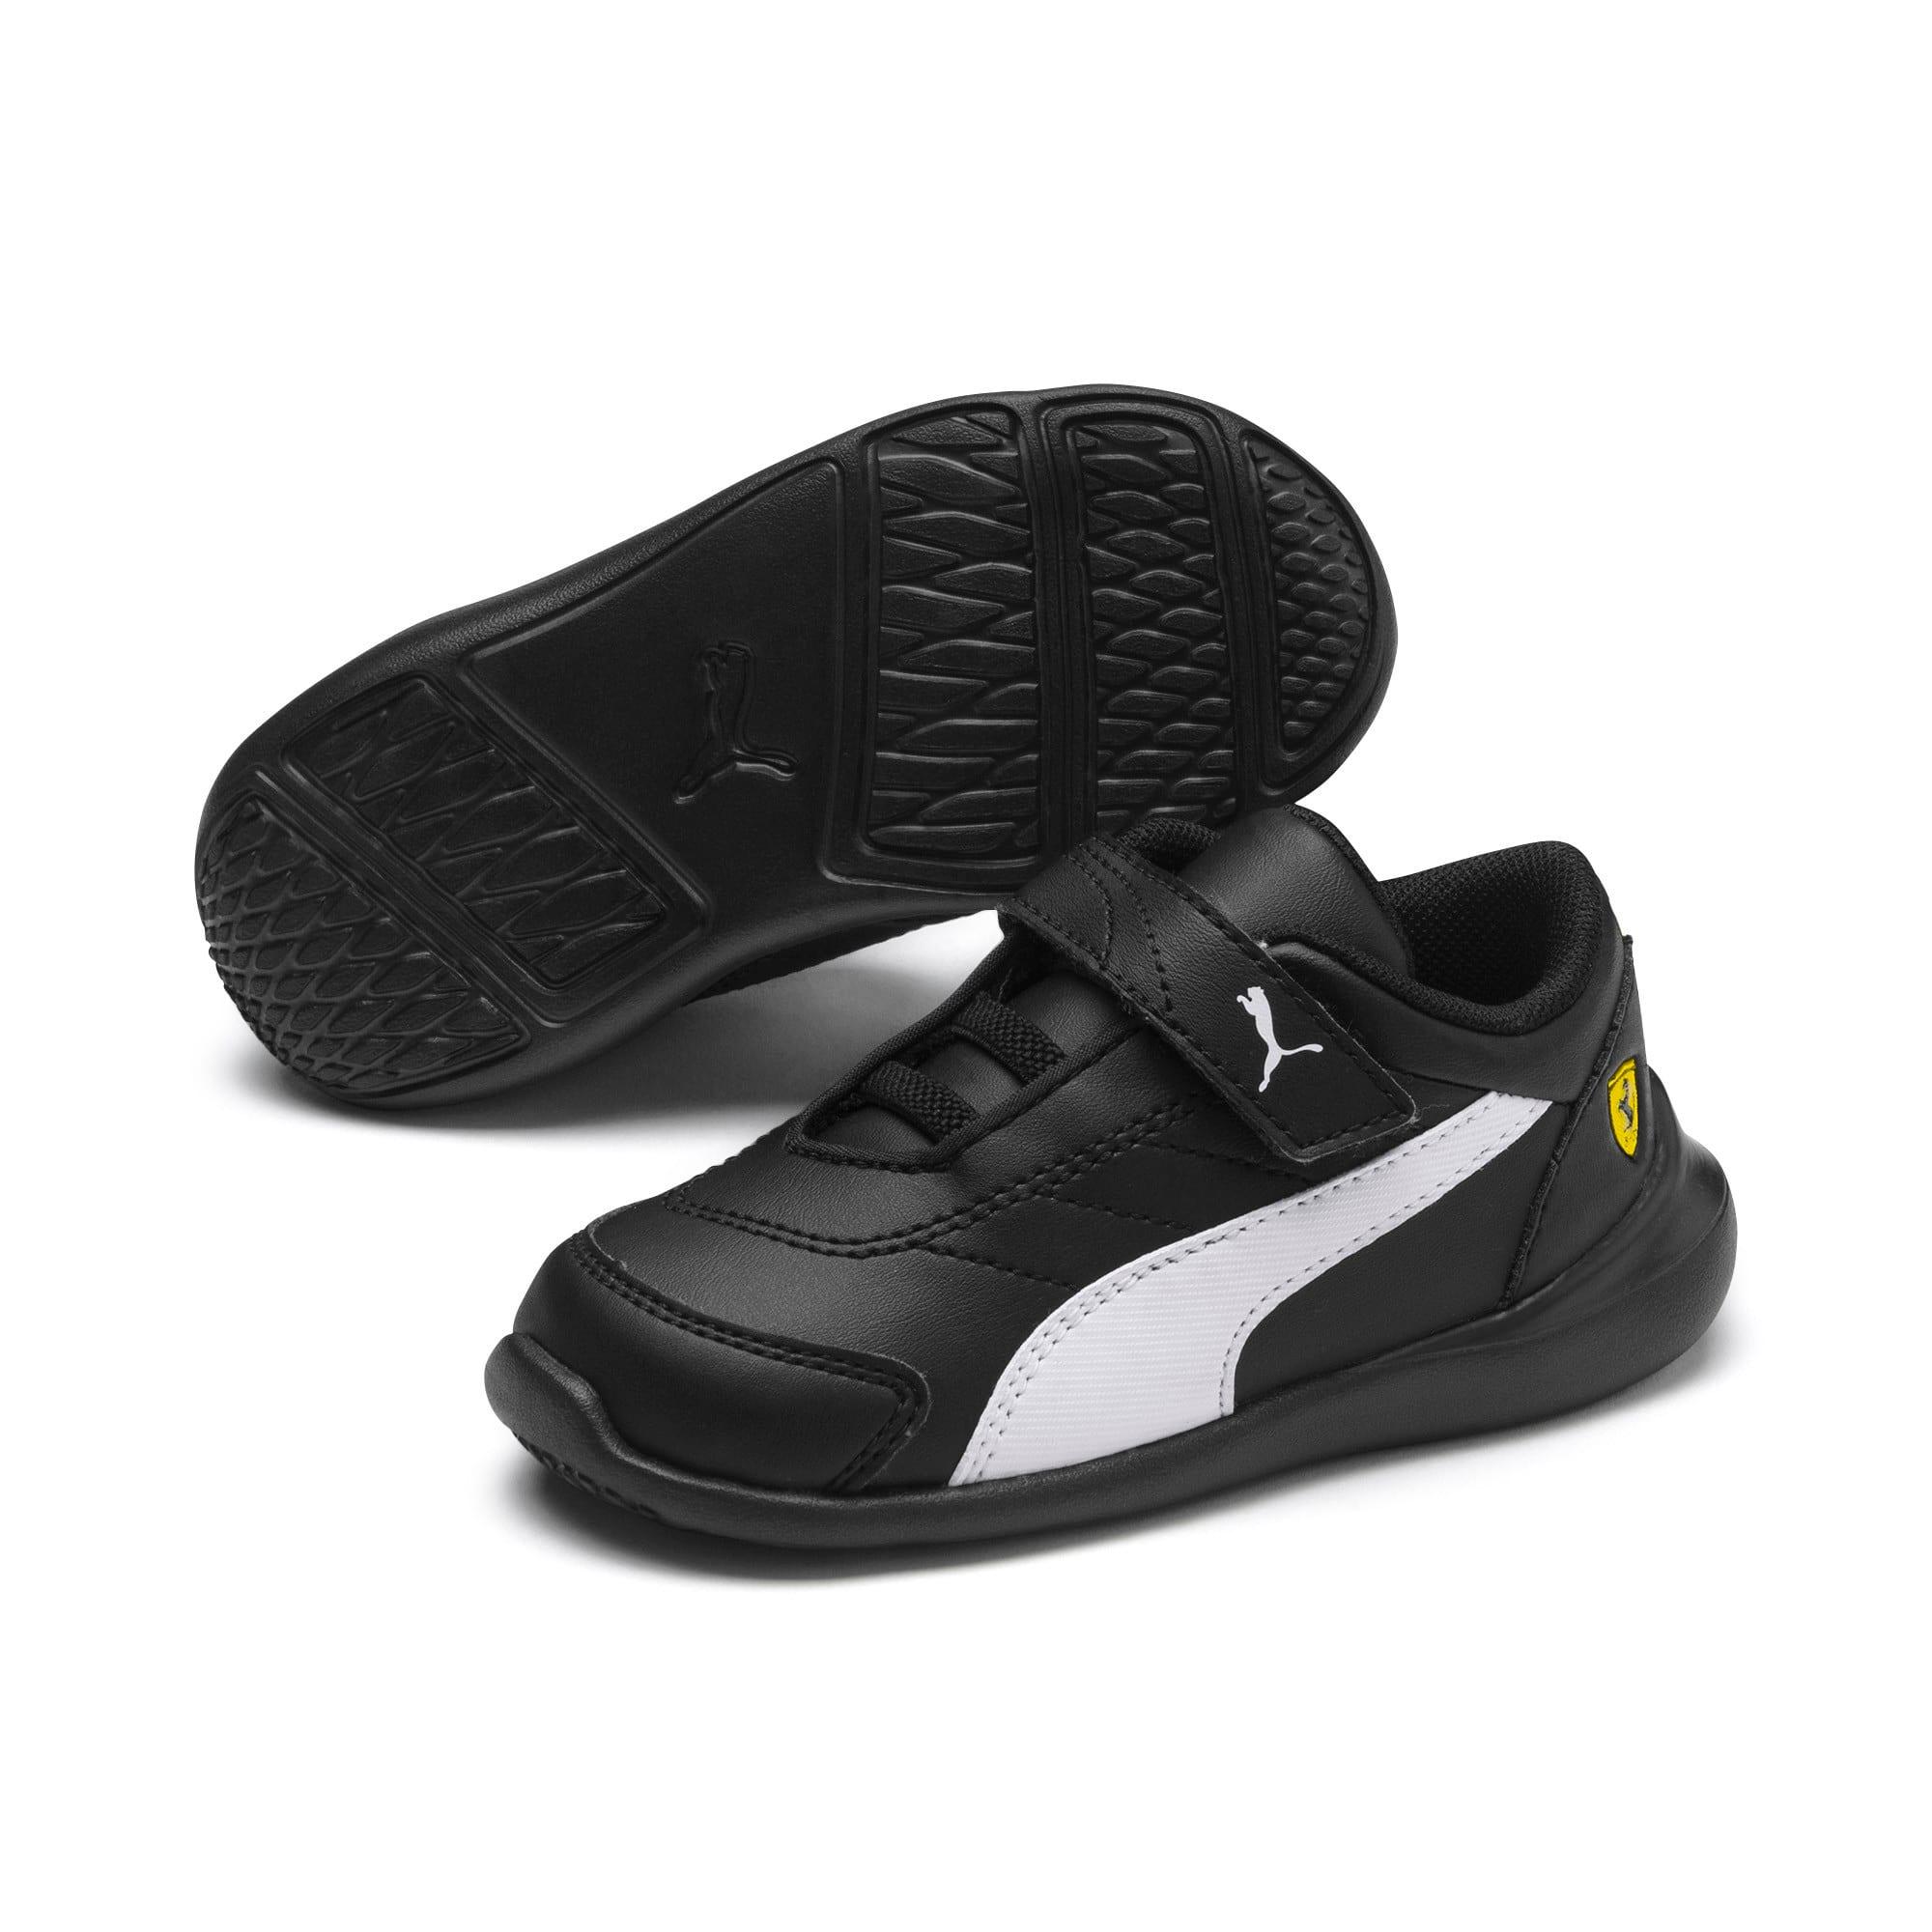 Thumbnail 2 of Scuderia Ferrari Kart Cat III Toddler Shoes, Black-White-Blazing Yellow, medium